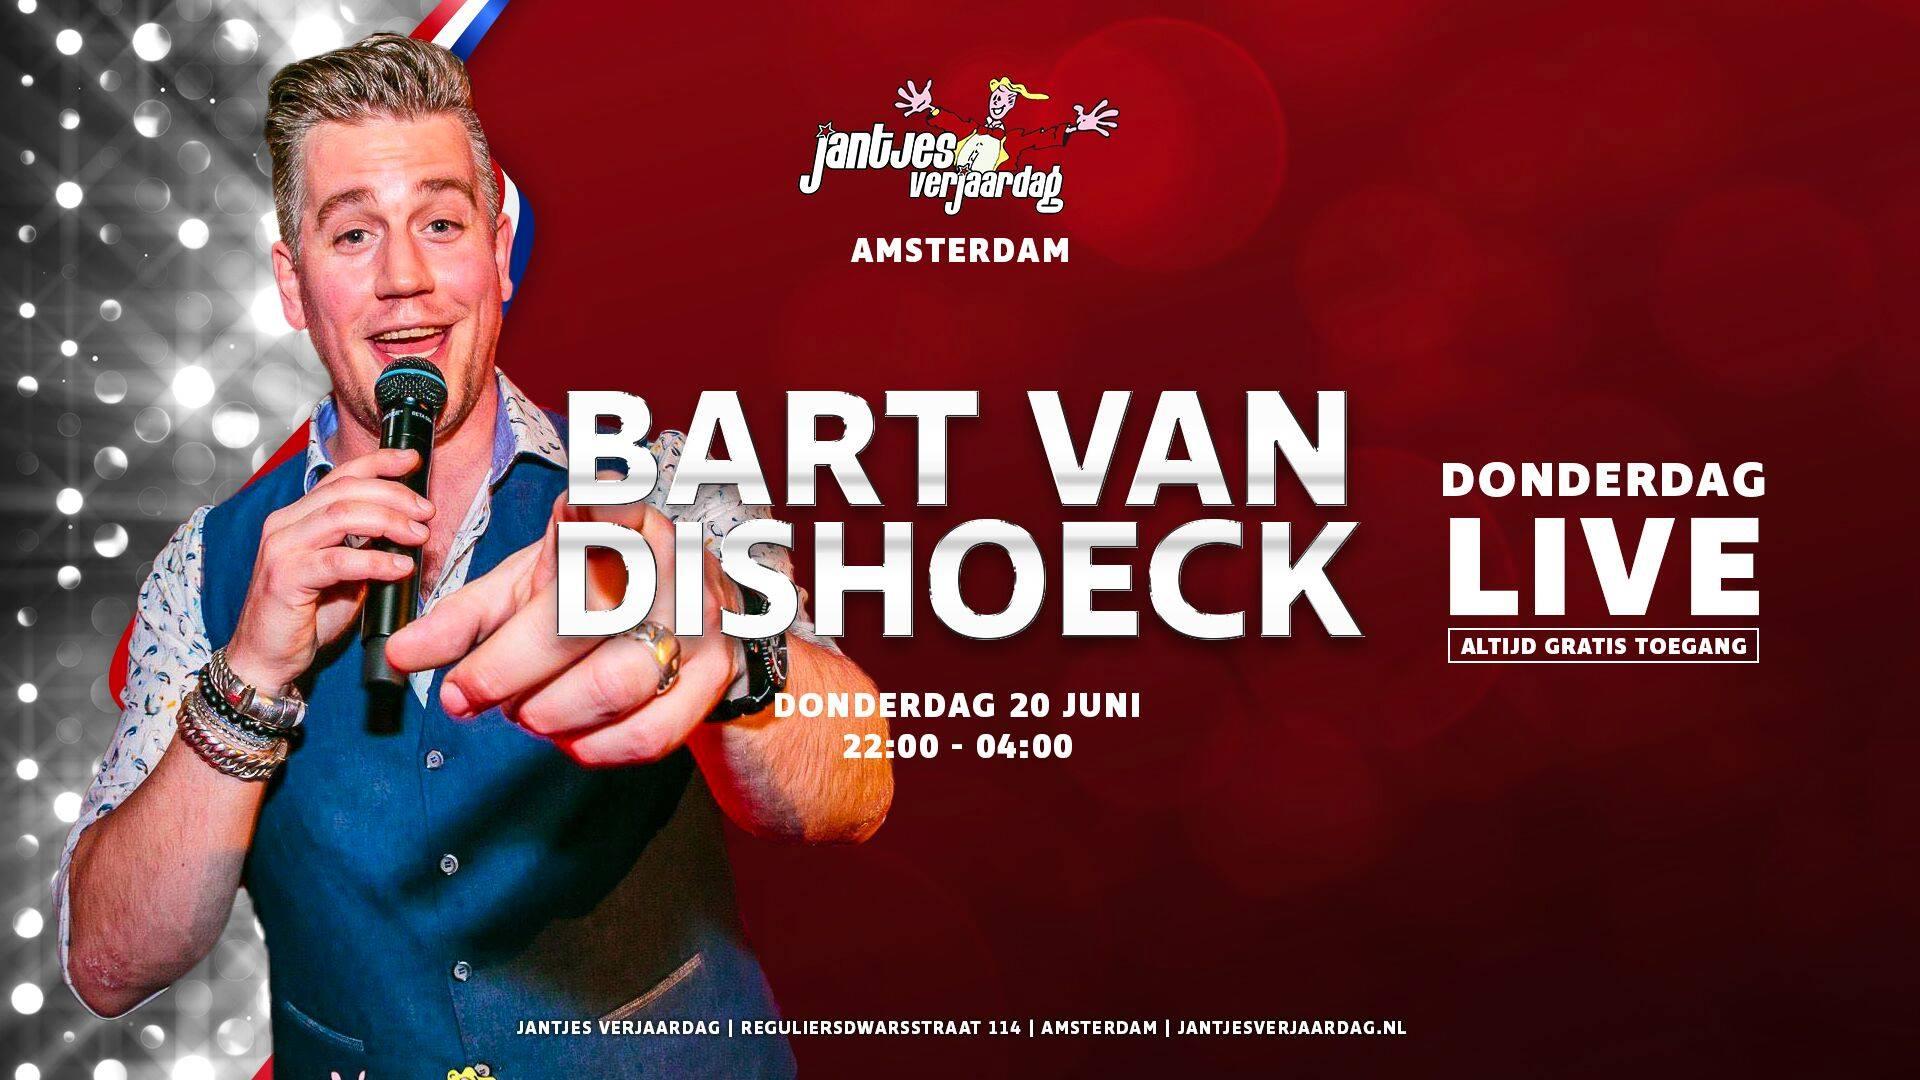 Donderdag LIVE - Bart van Dishoeck